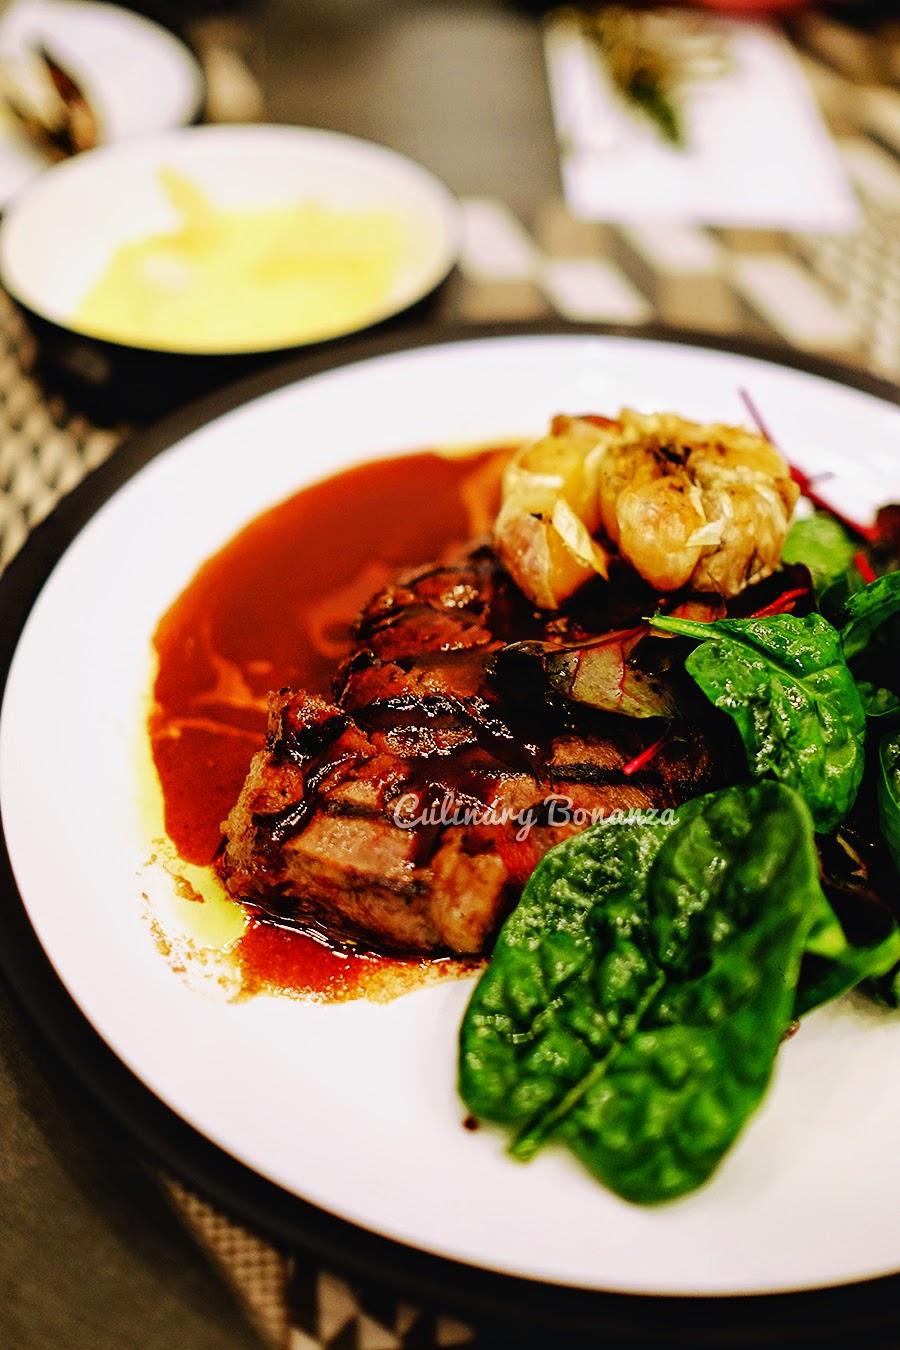 Bistecca at GIA Italian Restaurant and Lounge Jakarta (source www.culinarybonanza.com)